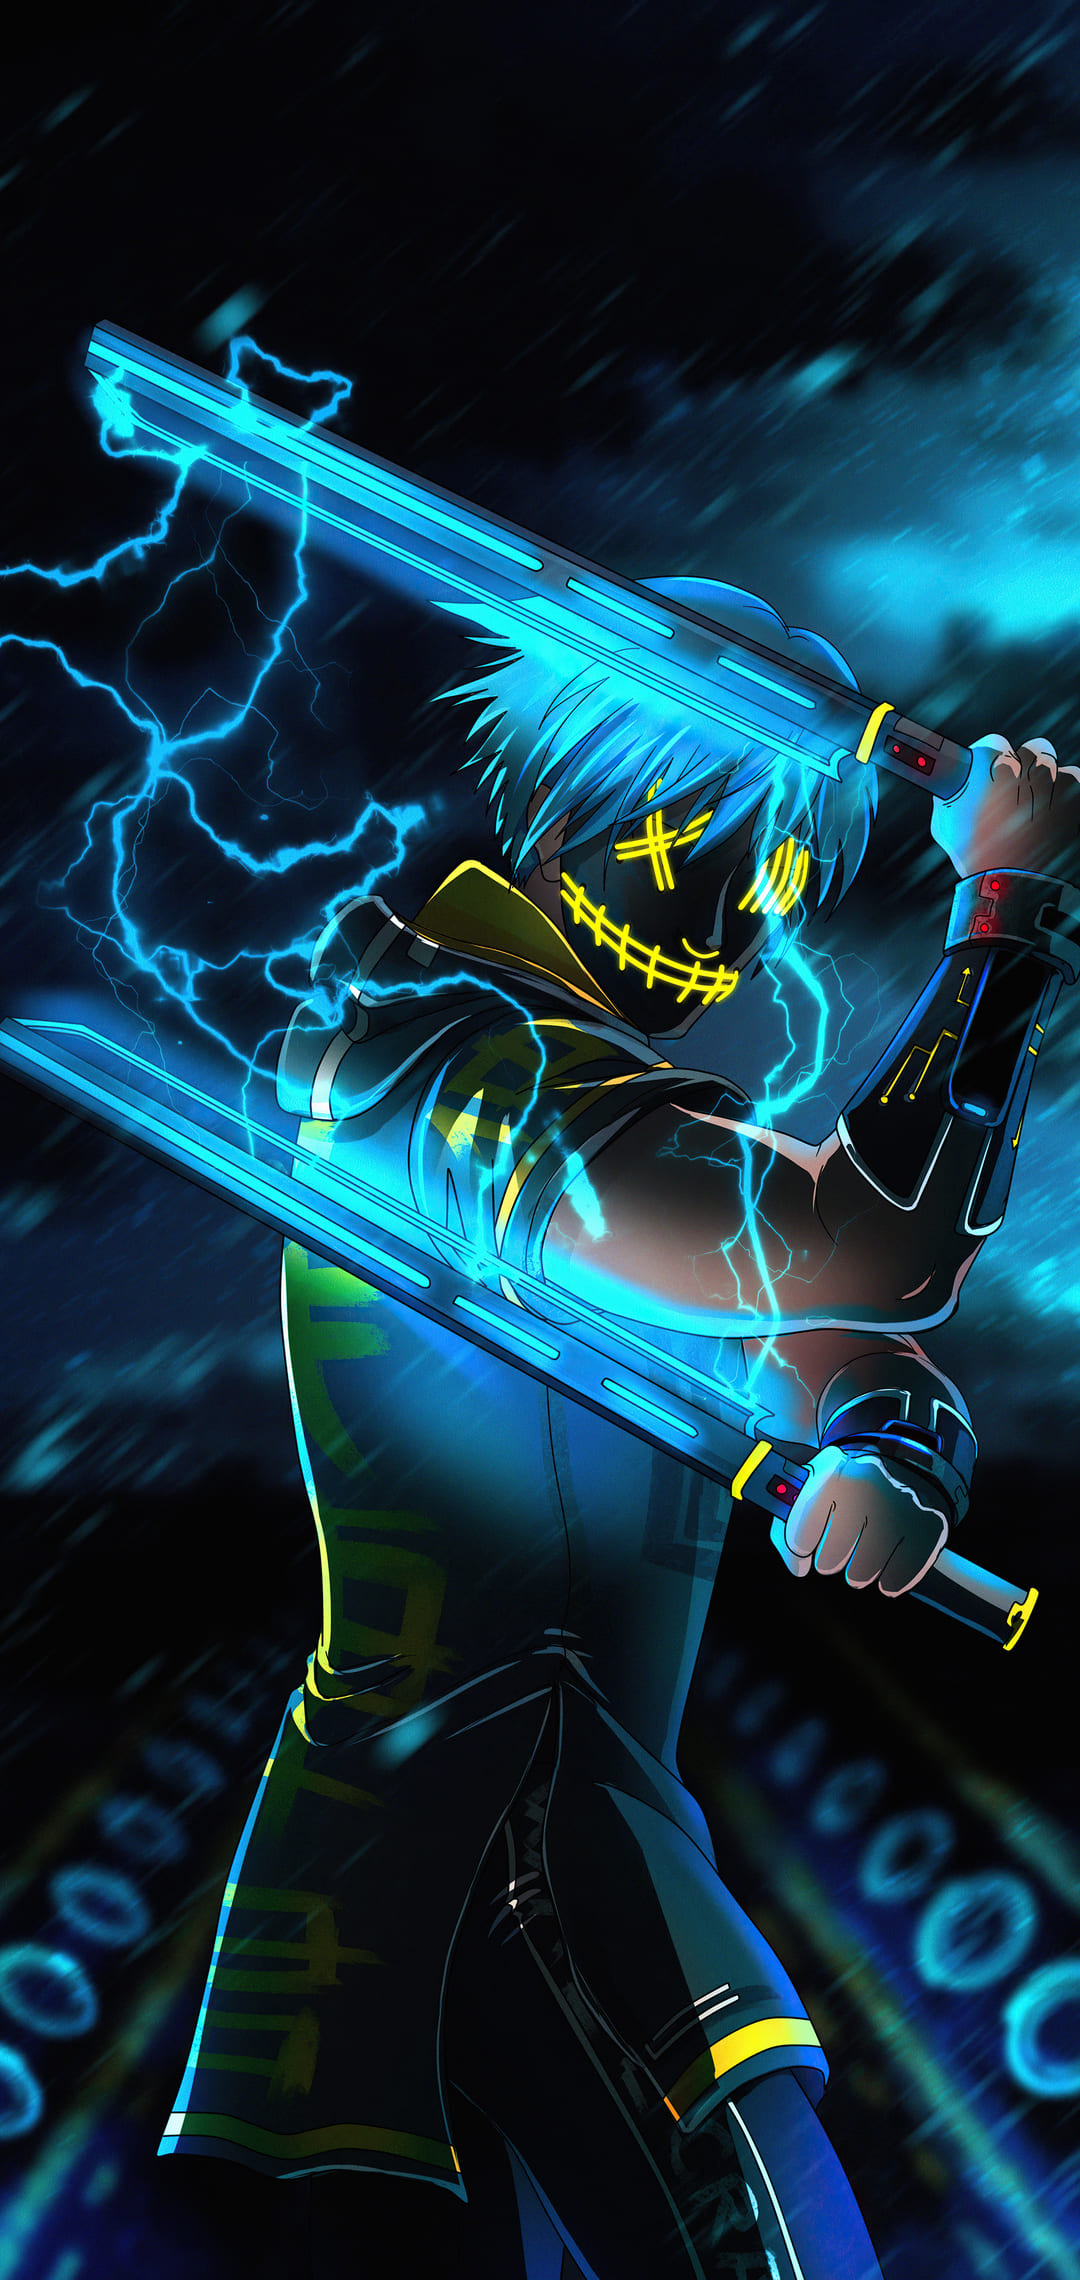 Anime Wallpaper For Boy   Best Anime Wallpaper Download